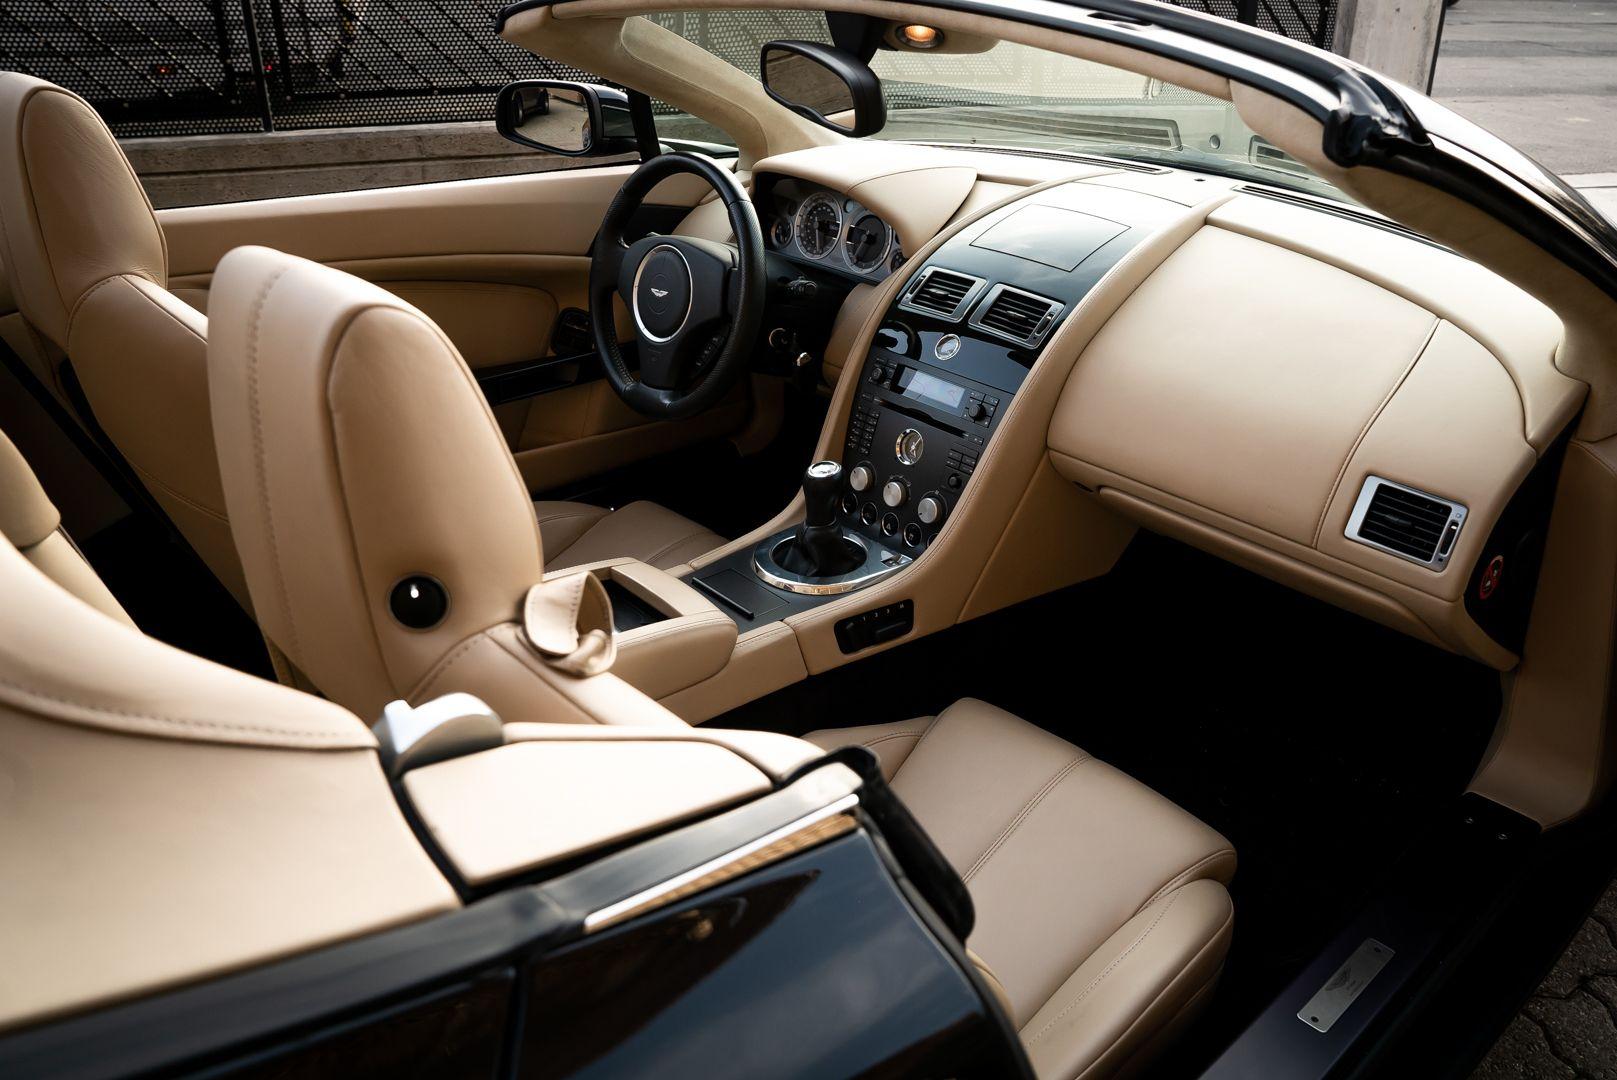 2008 Aston Martin 4.3 V8 Vantage Roadster N400 82824